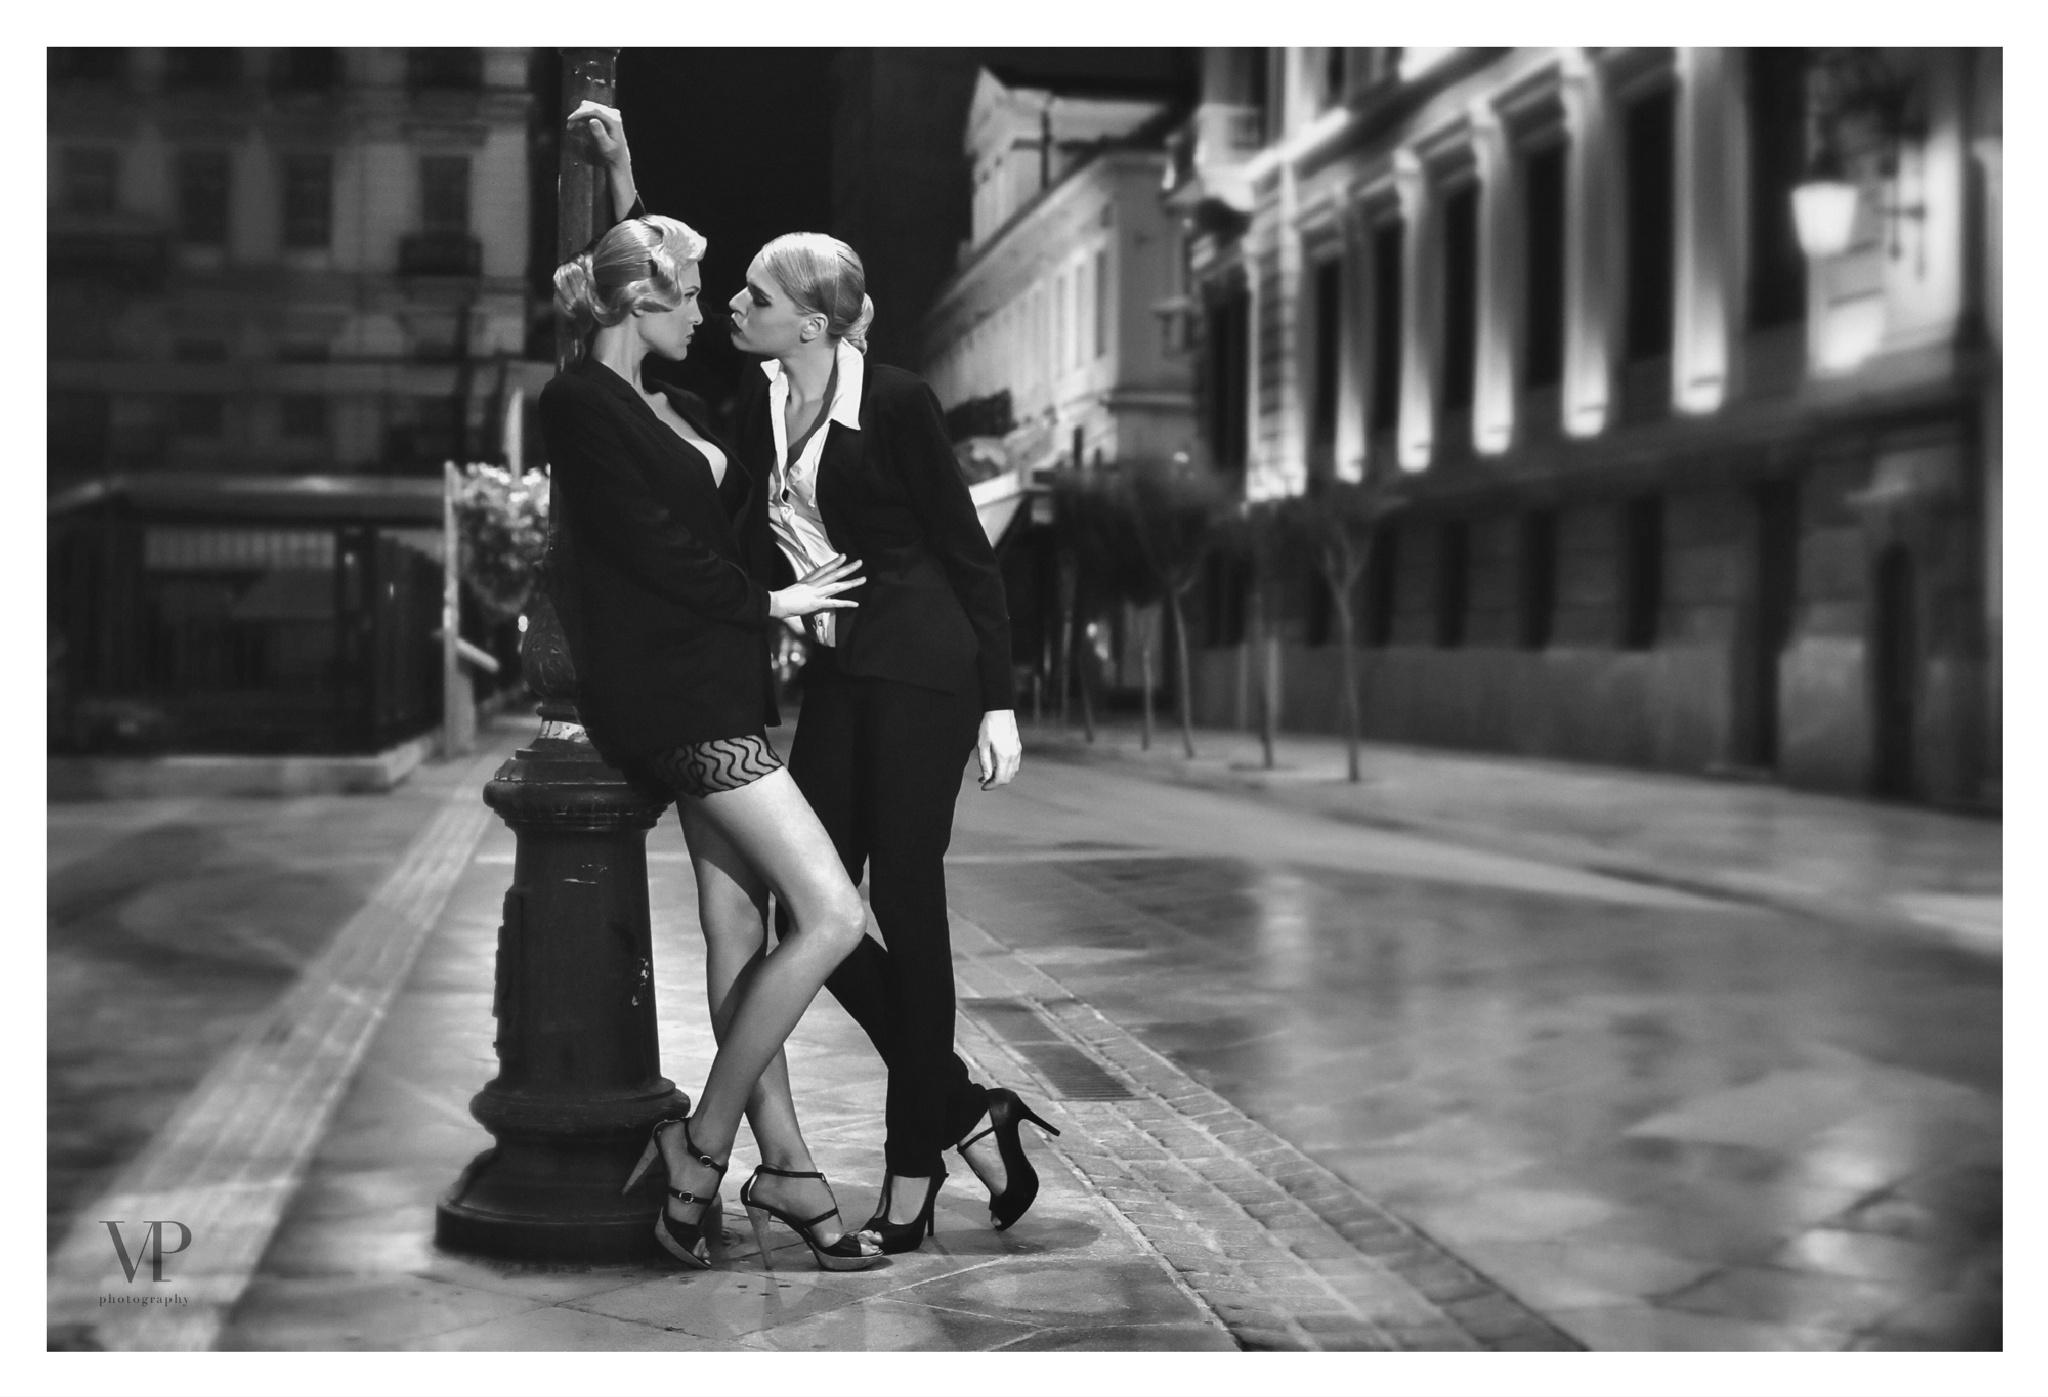 Tango more by @vassilispitoulis